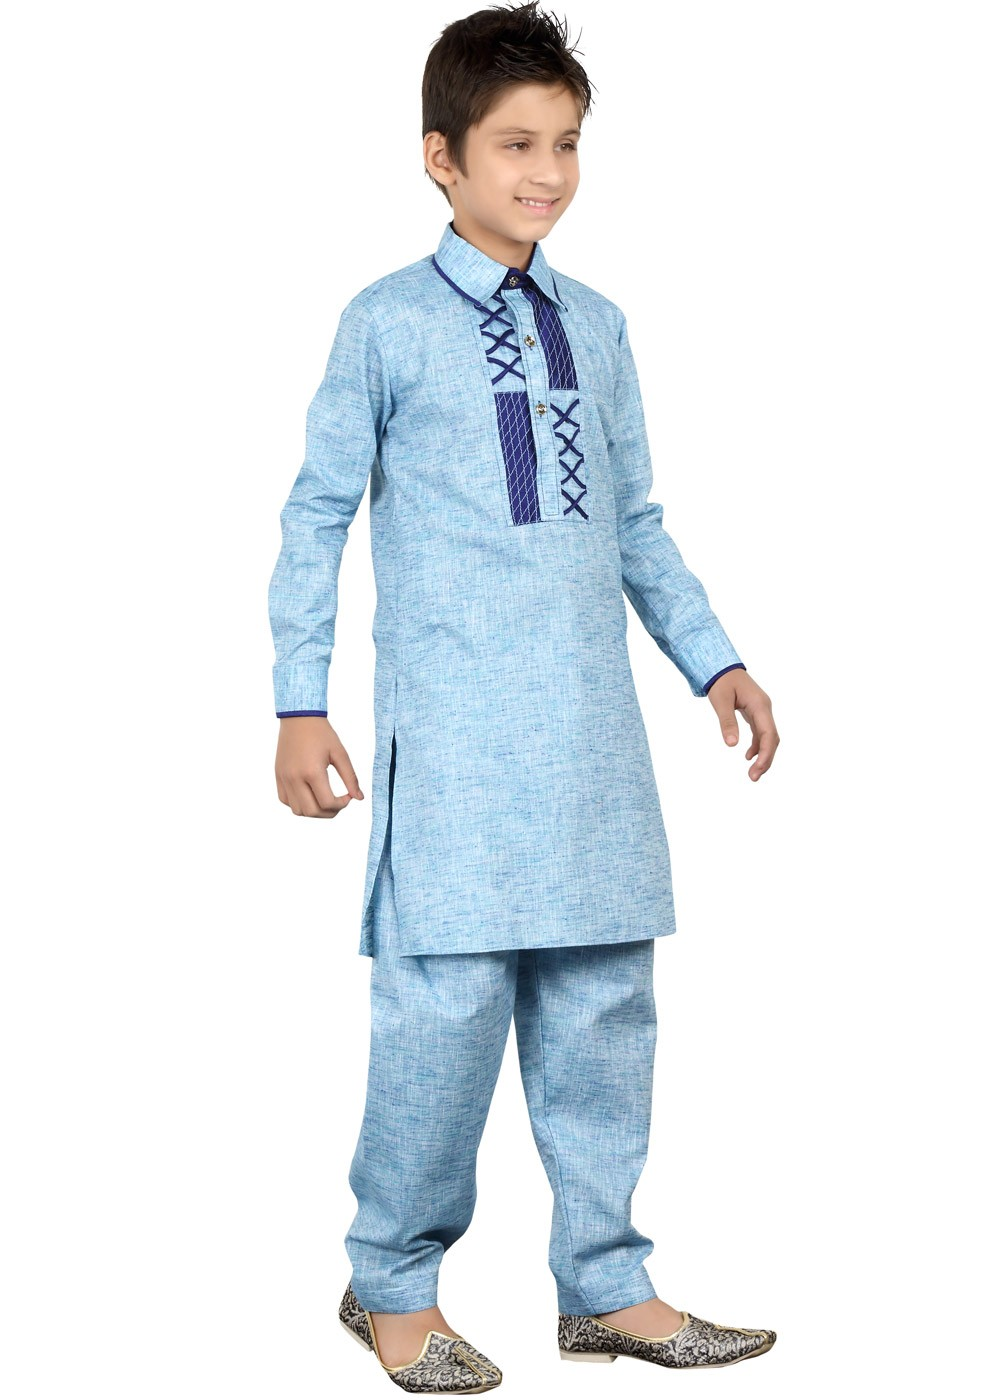 Readymade Blue Kids Linen Pathani Suit Kids 148KW07